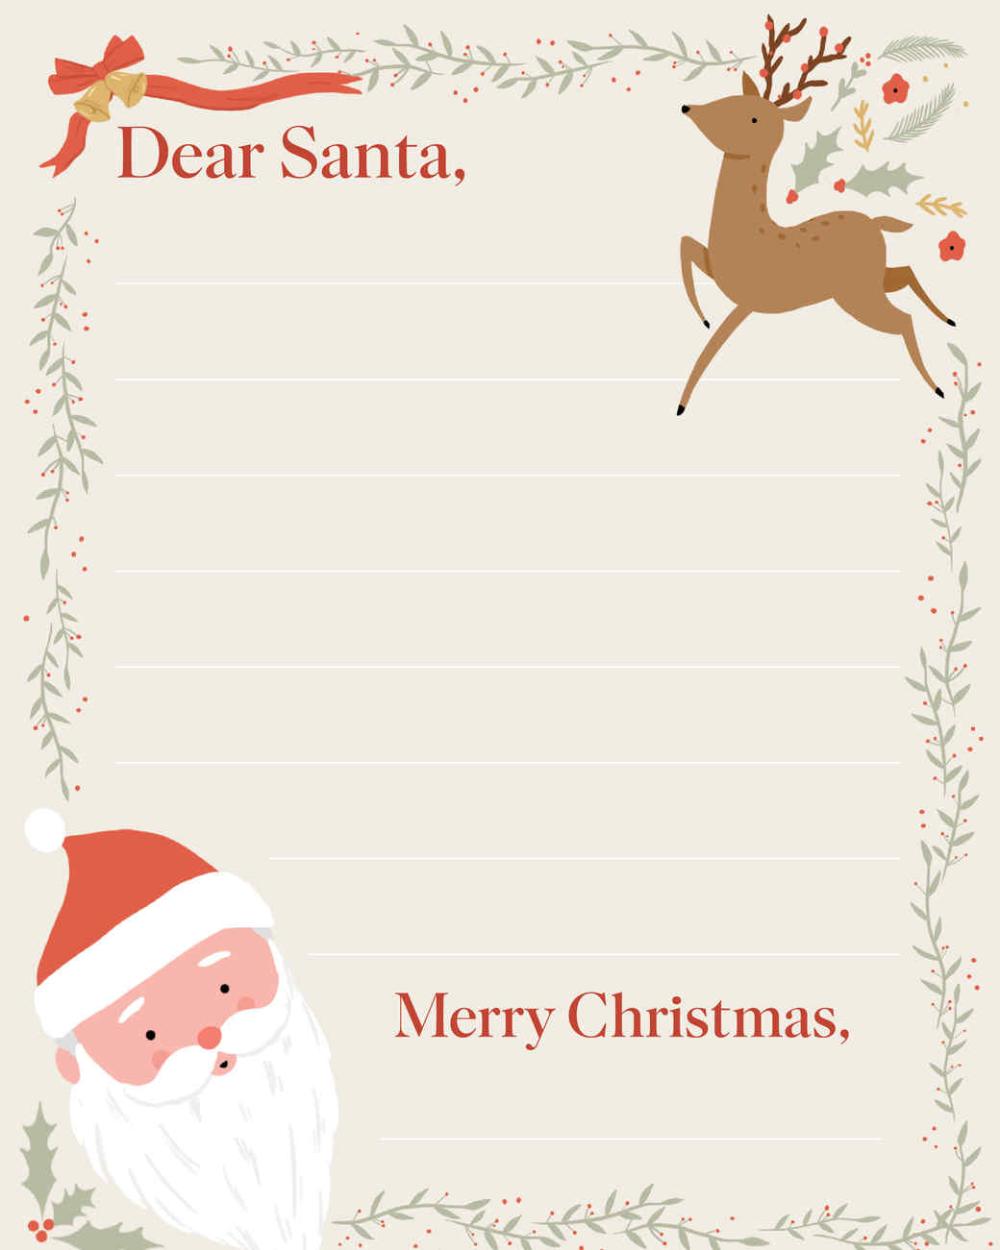 Letter to Santa Santa letter, Santa letter template